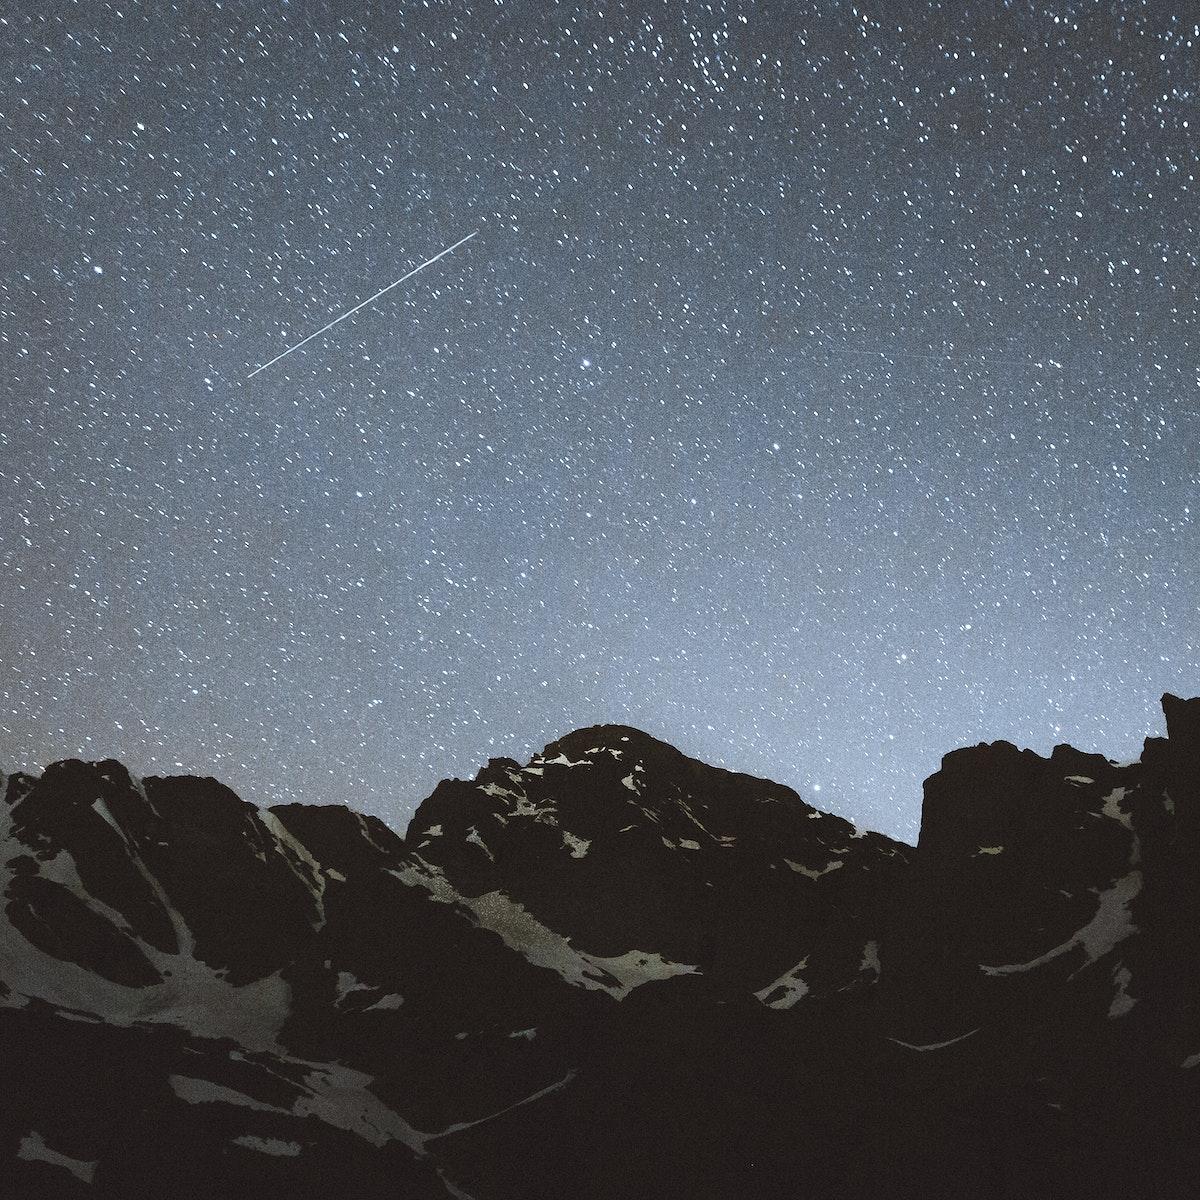 Starry night sky in Banff Alberta, Canada